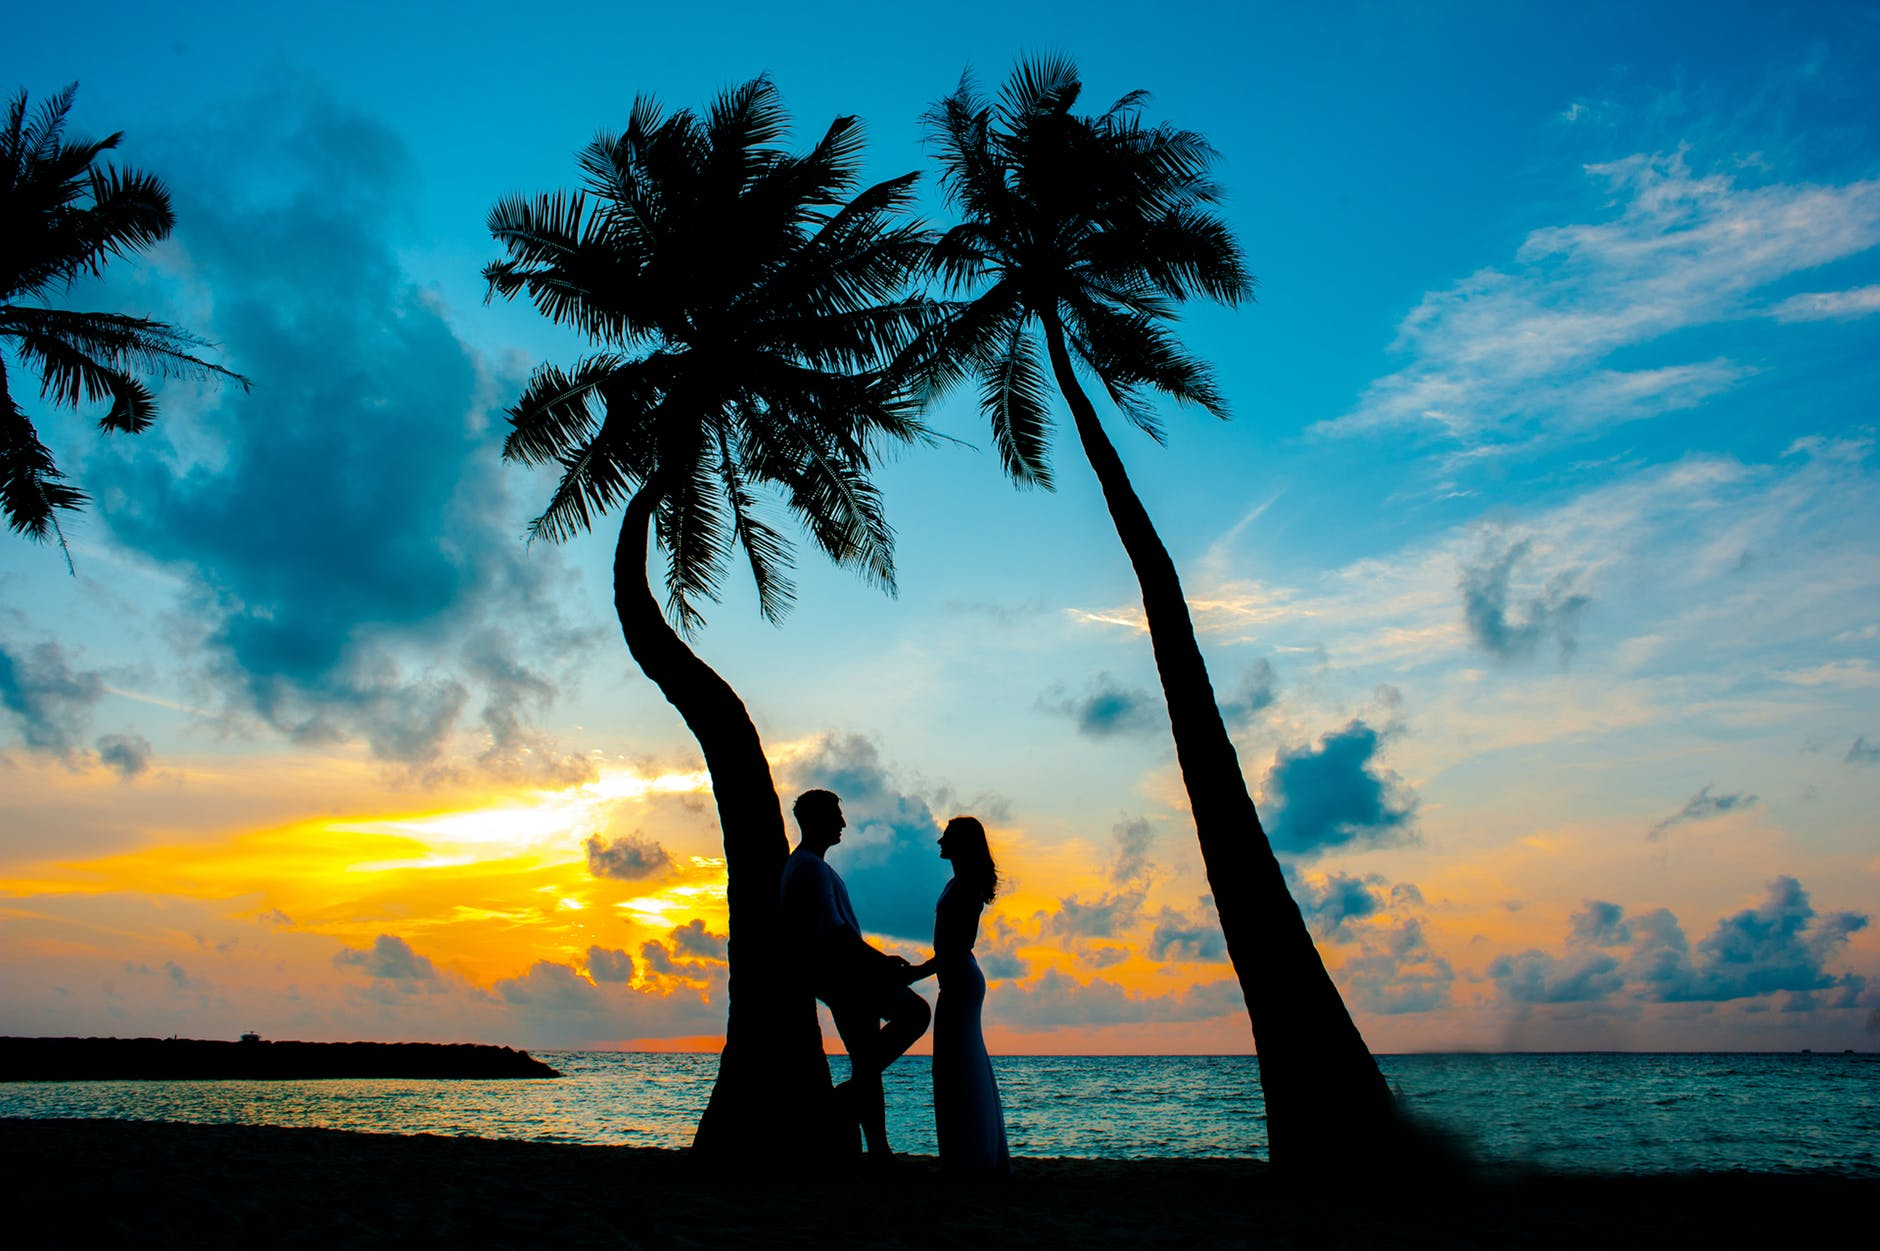 عکس عاشقانه دختر و پسر لب ساحل